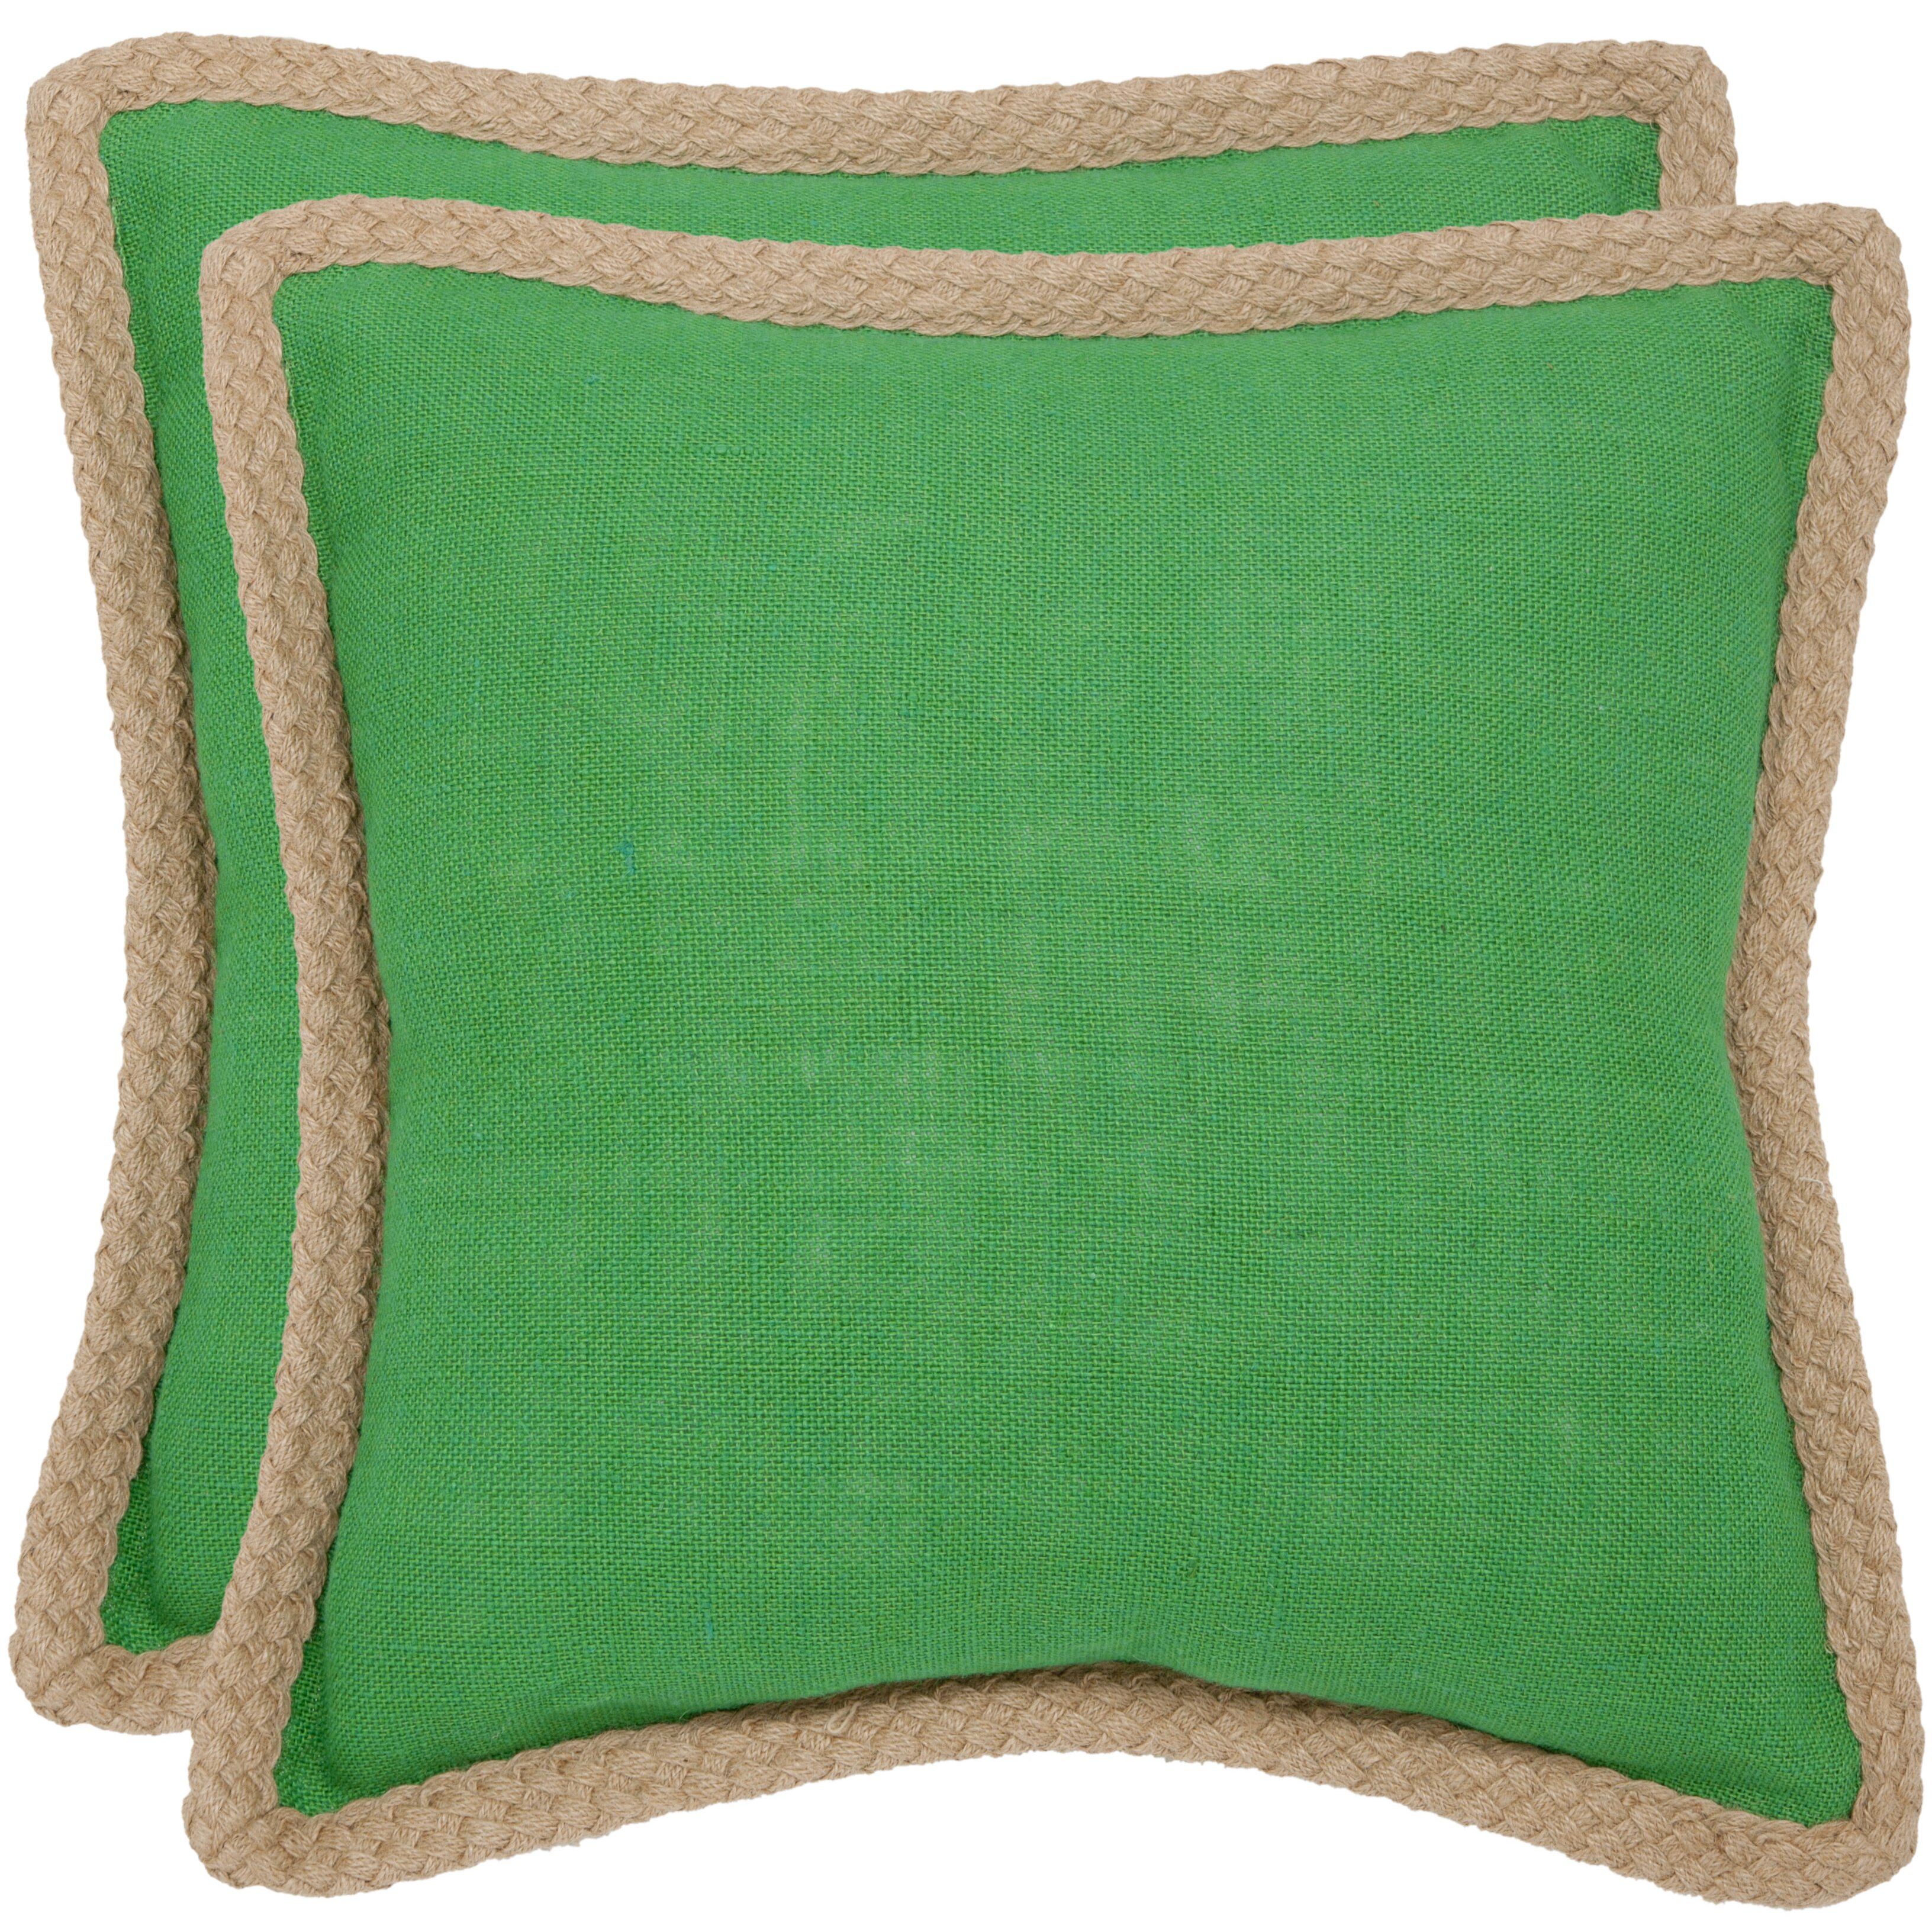 Jute Throw Pillow : Beachcrest Home Yorkton Jute Fiber Cotton Throw Pillow & Reviews Wayfair